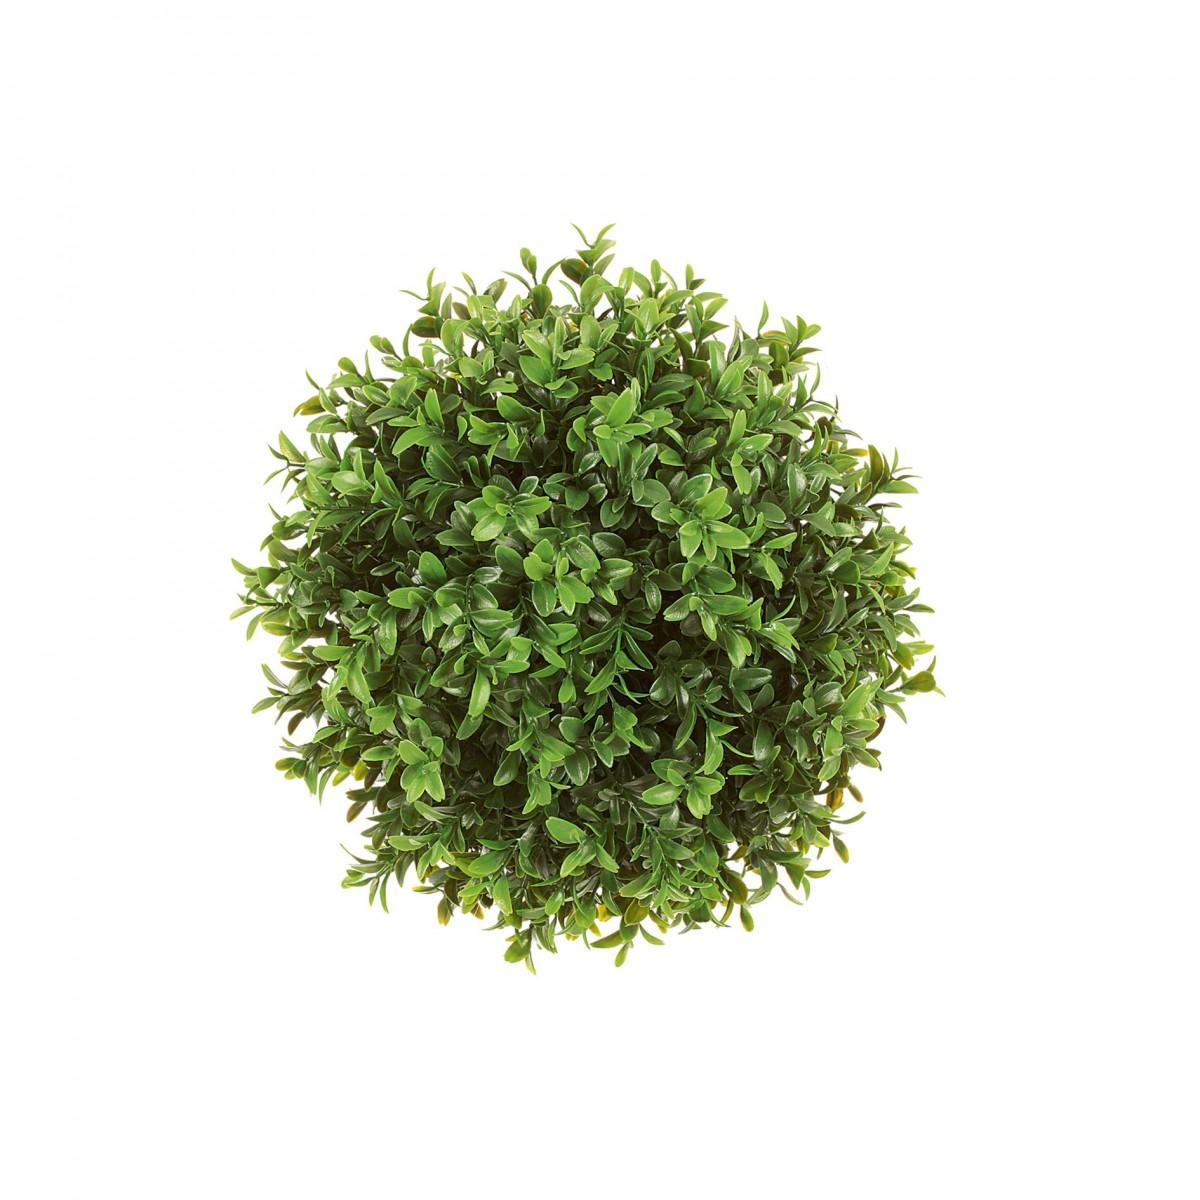 Buchsbaumkugel Kunstpflanze 25 cm